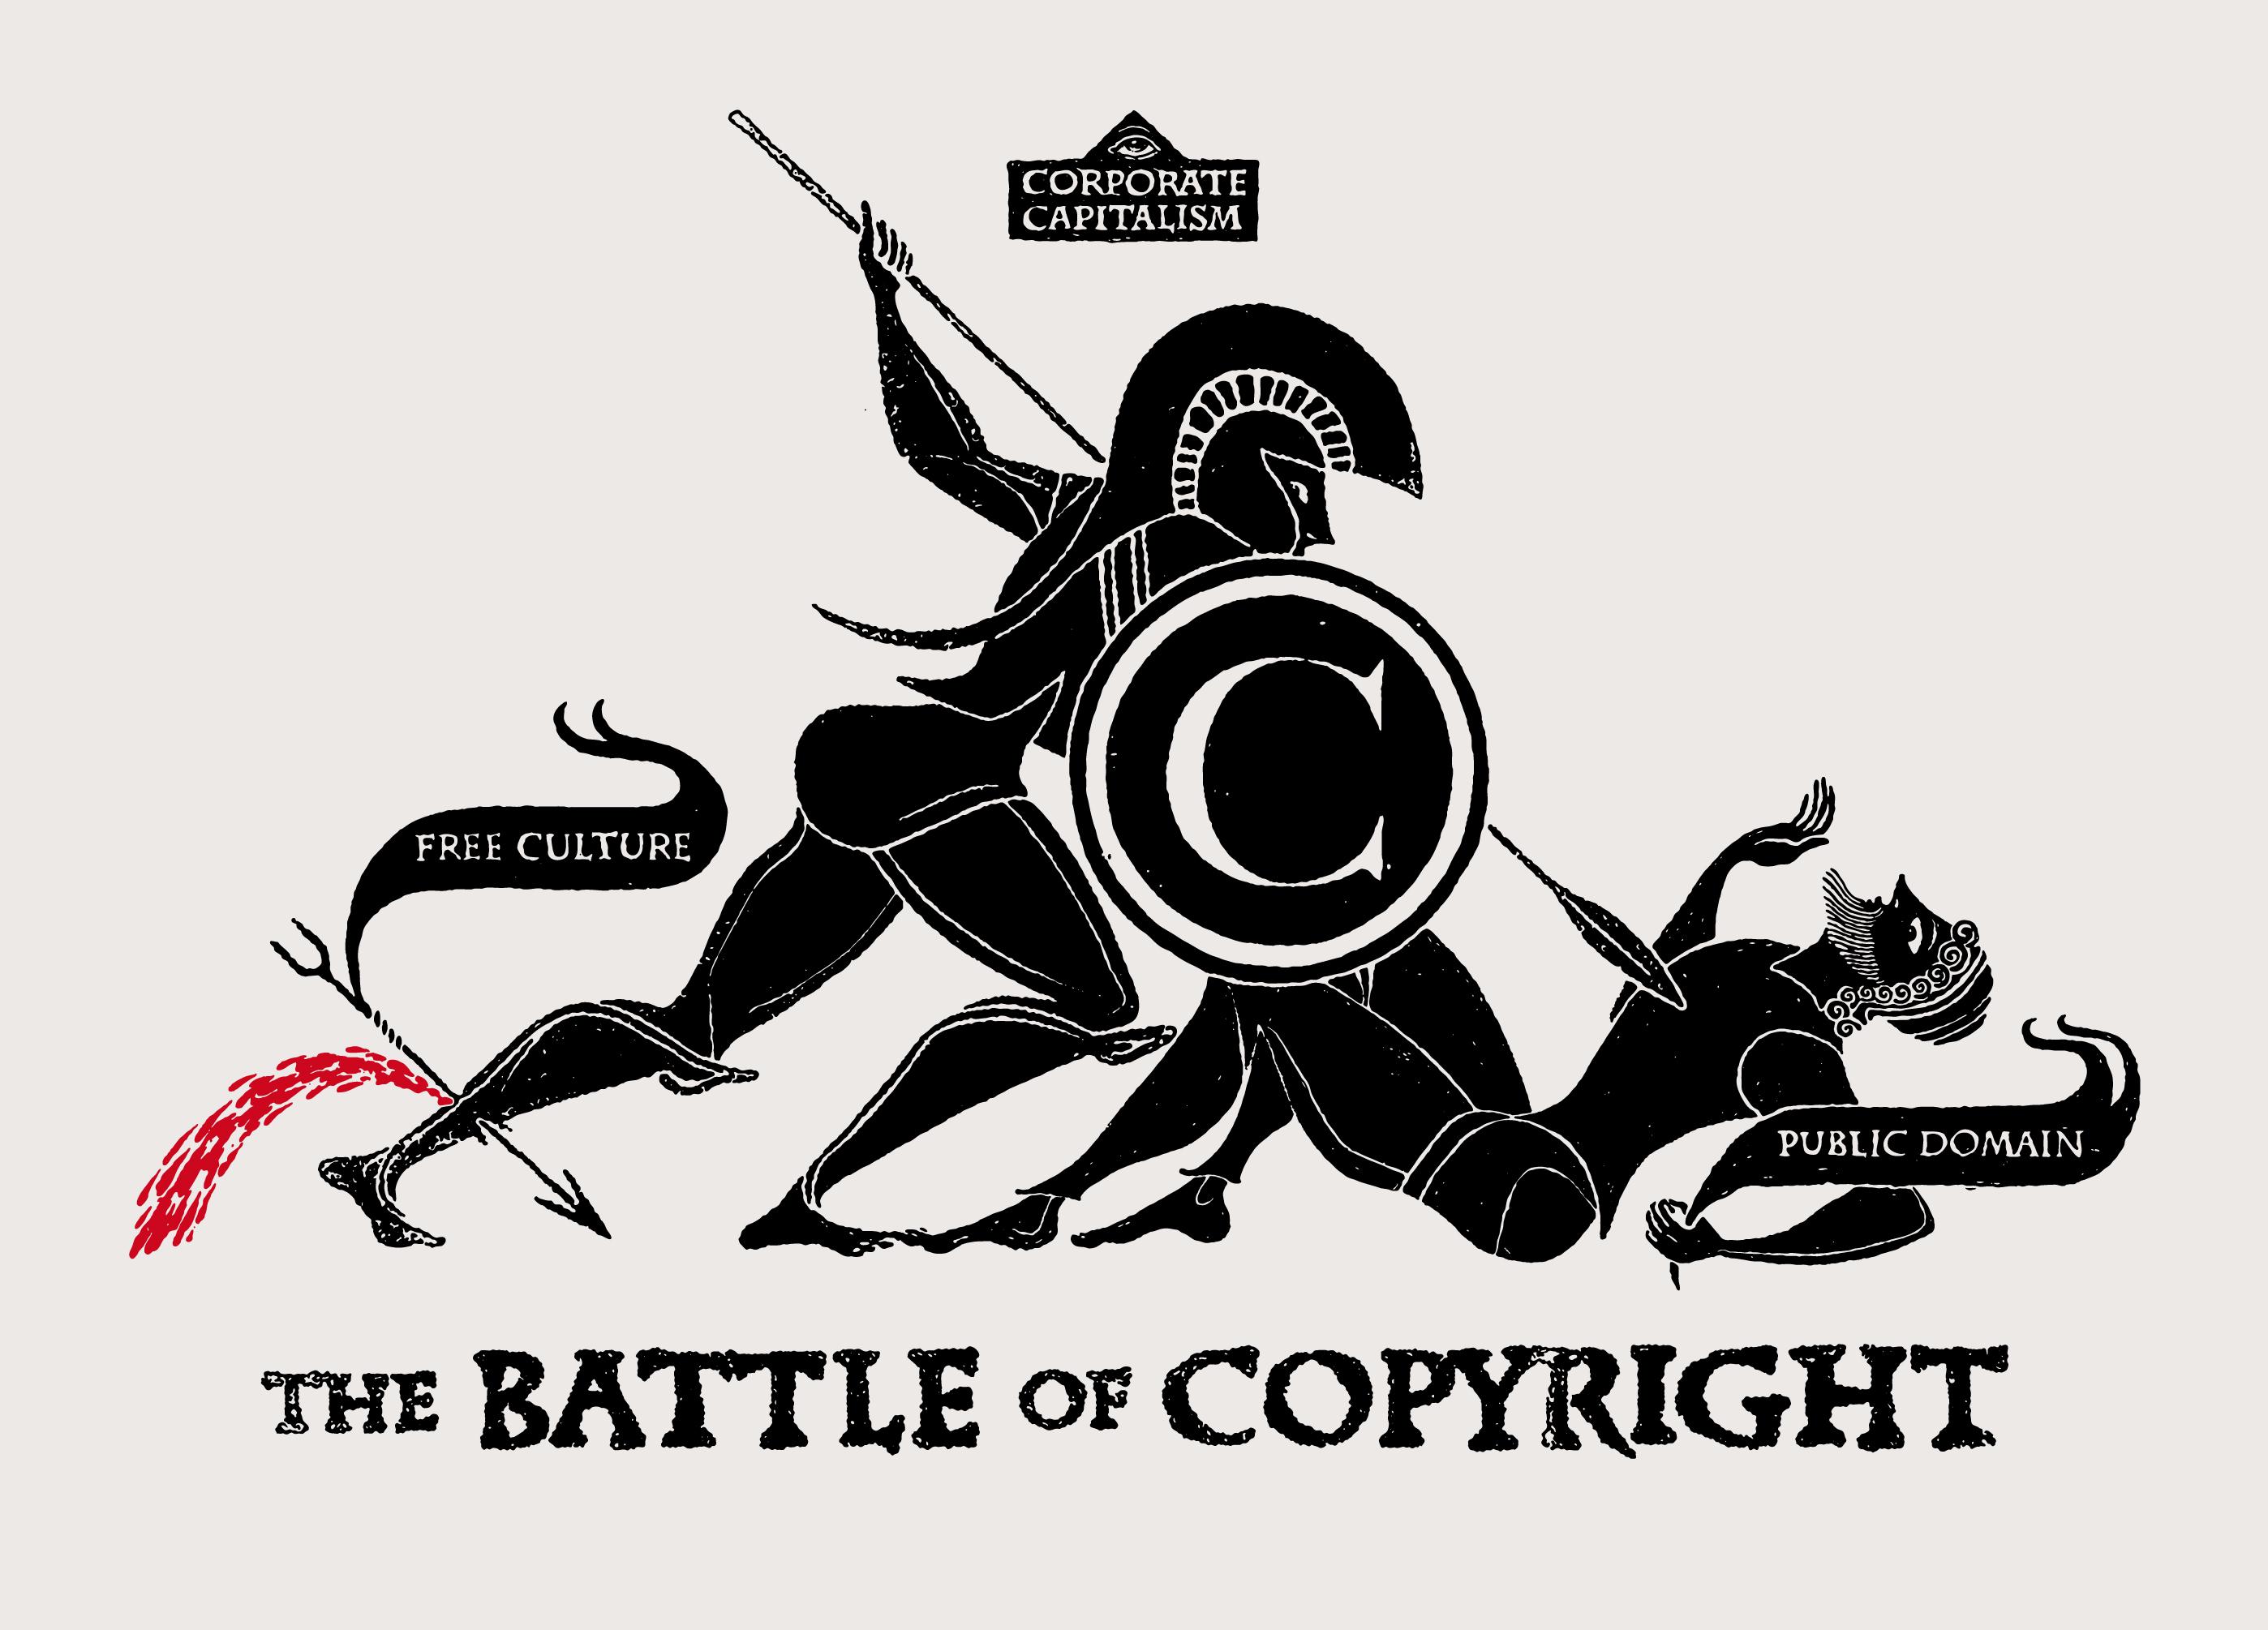 Embedded copyright meta data in files